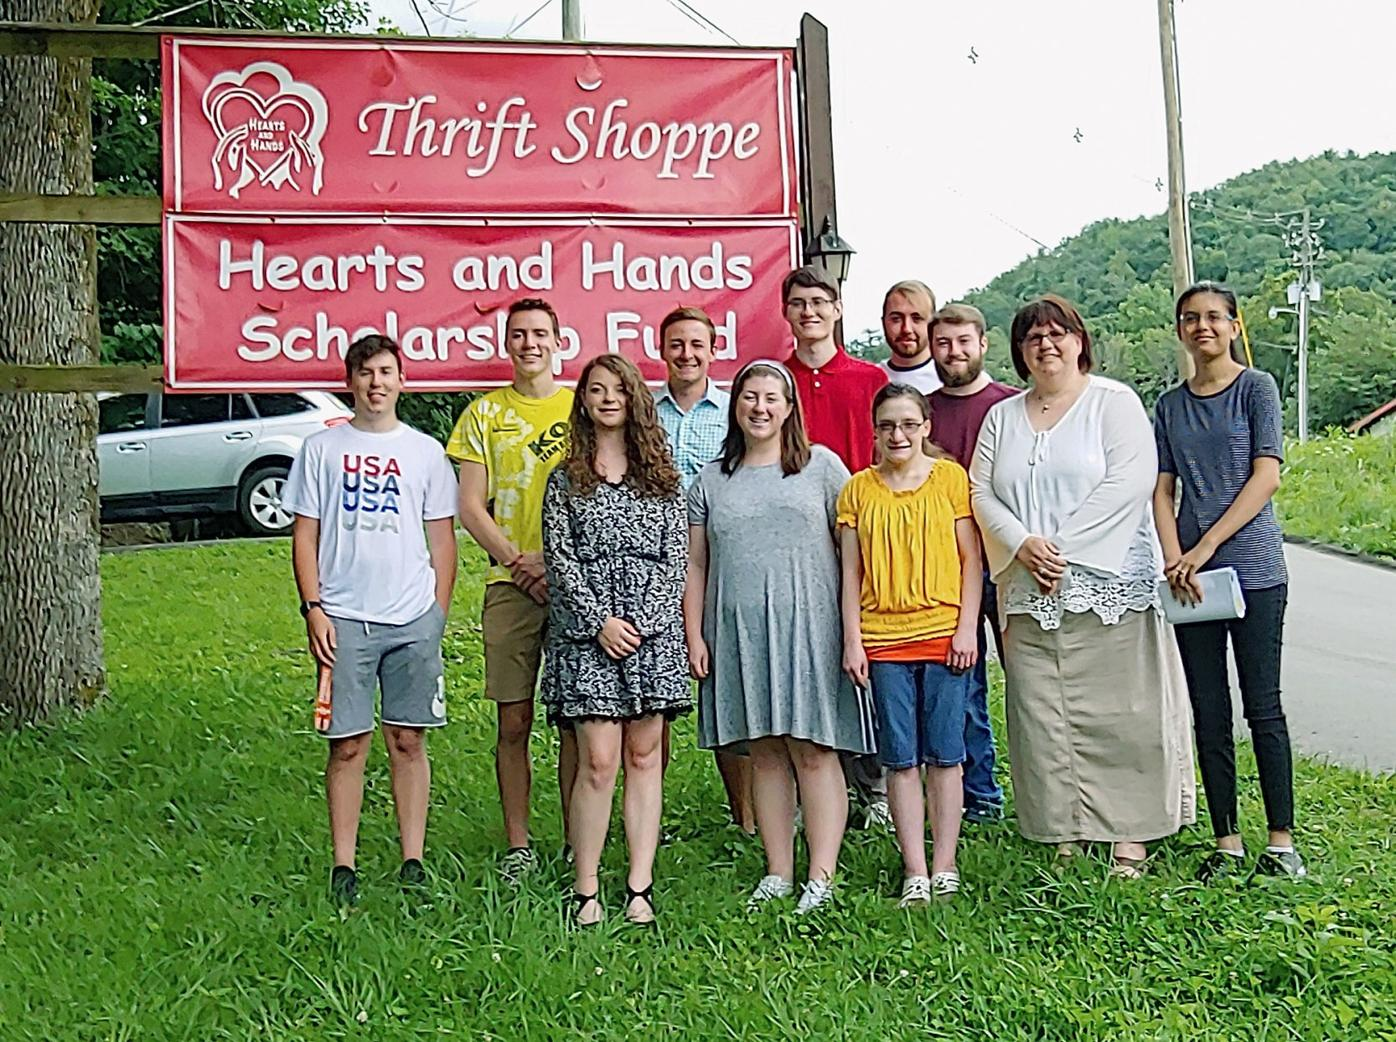 Hearts and Hands scholarship recipients